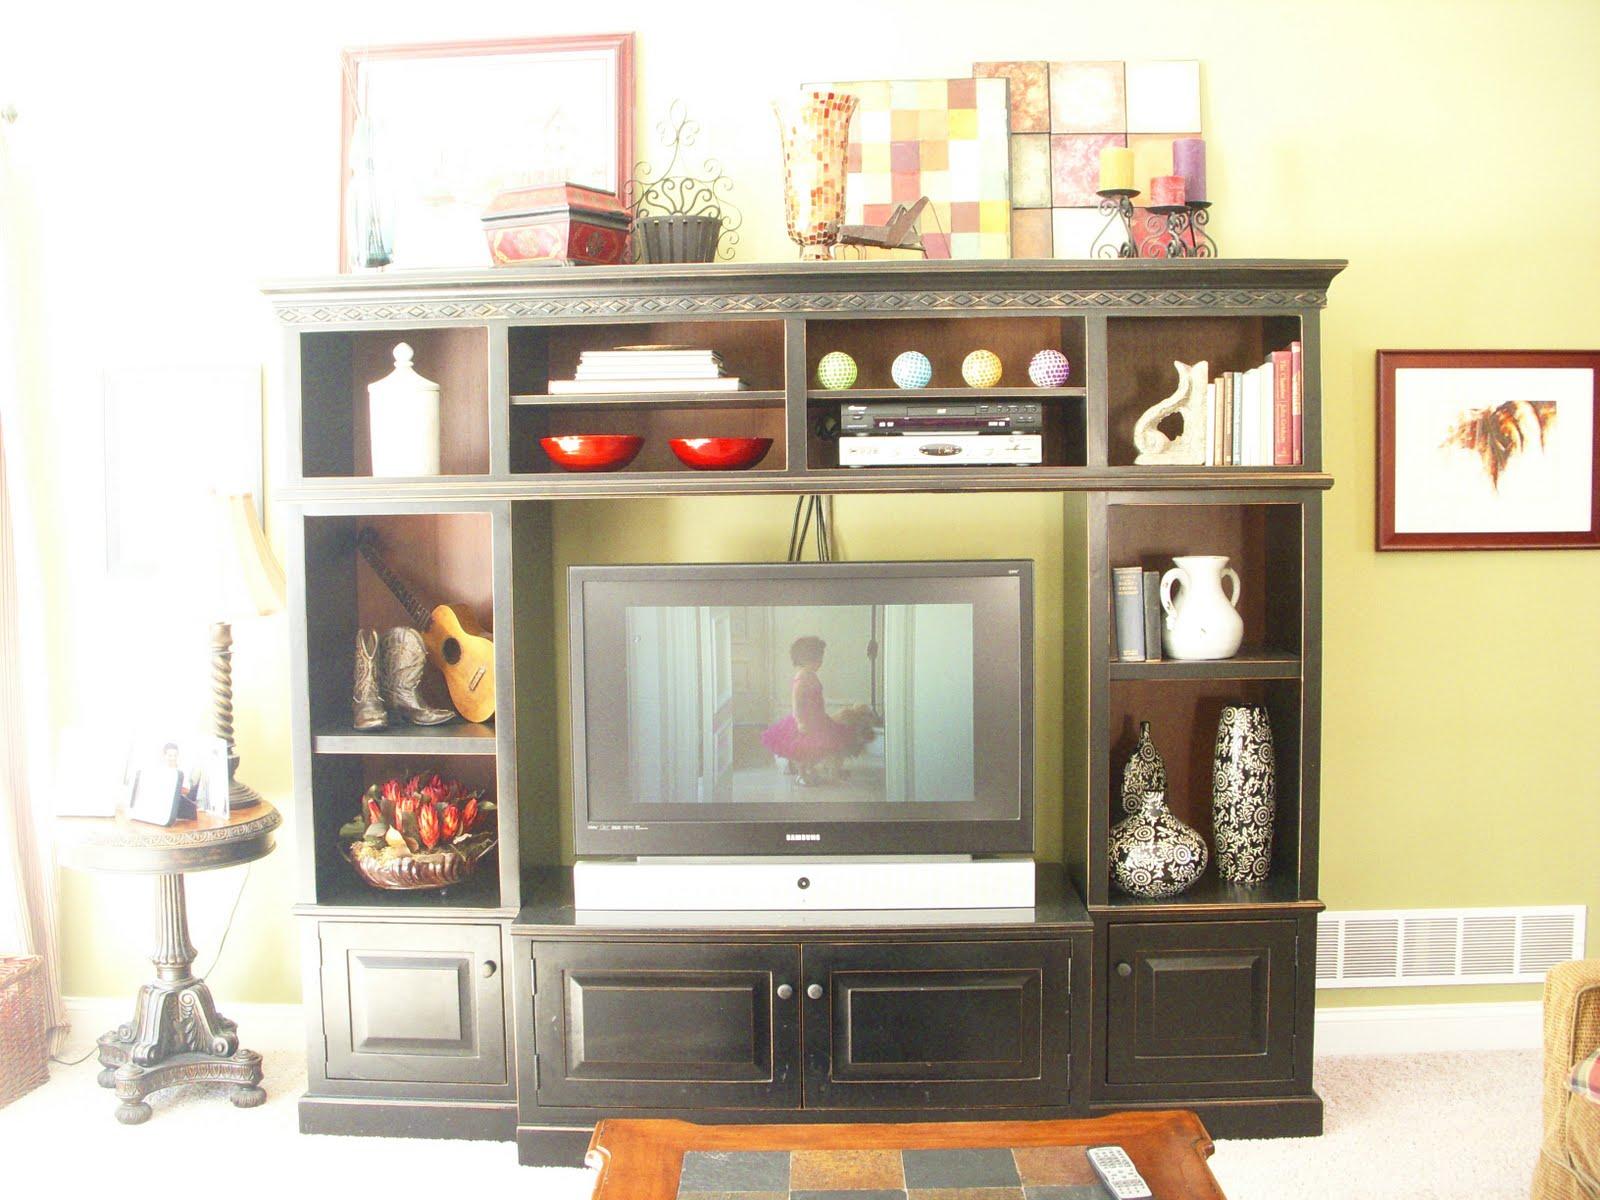 decorating ideas for entertainment center shelves 28. Black Bedroom Furniture Sets. Home Design Ideas